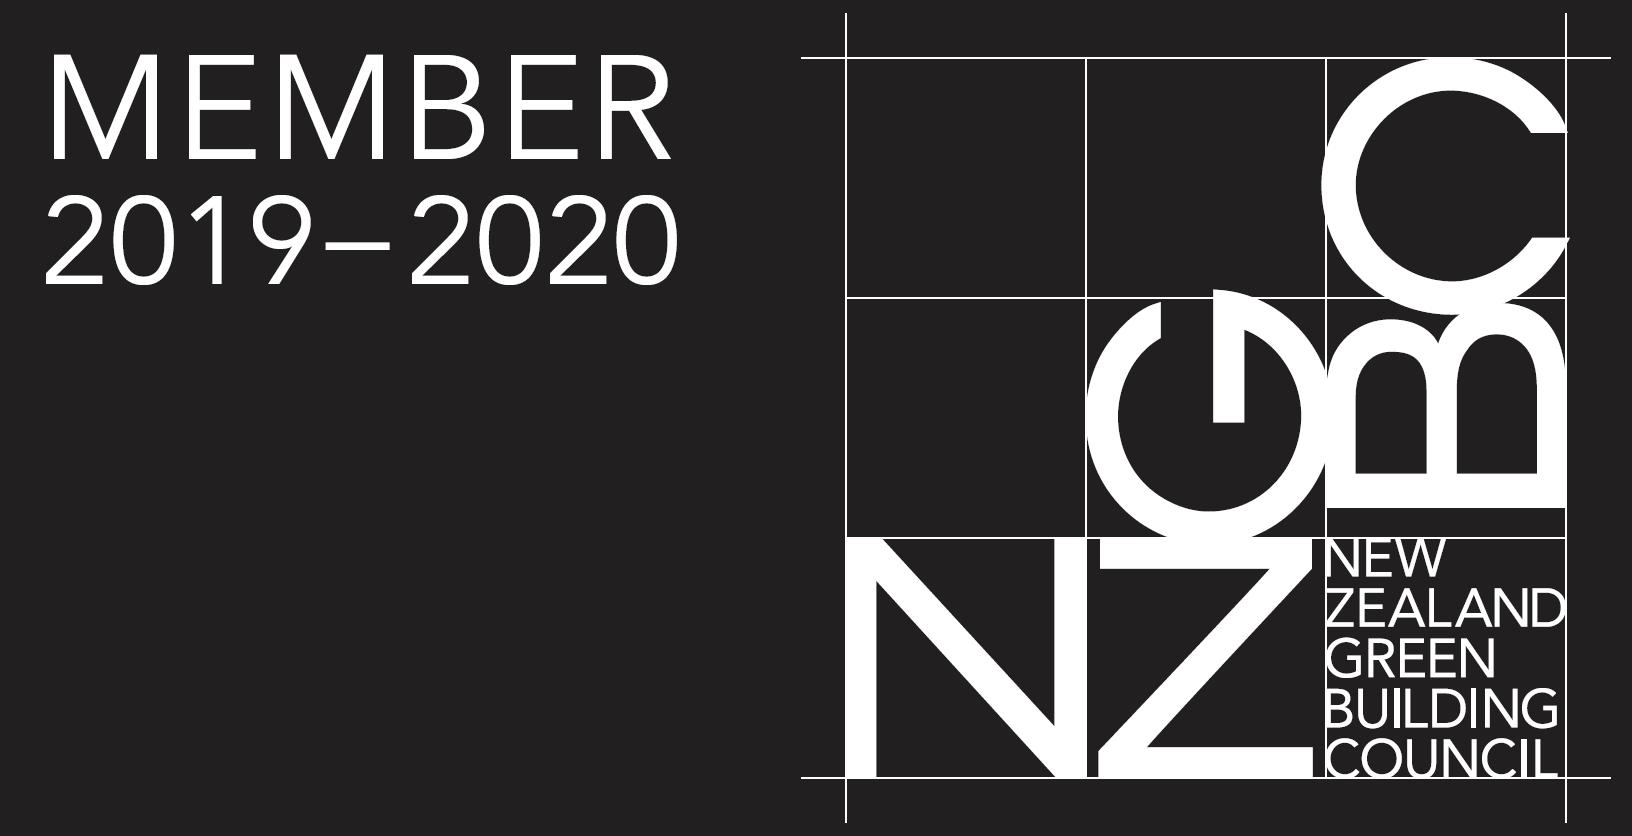 NZ_Green_Building_Council_Member_DLP_Construction_2019-20.PNG